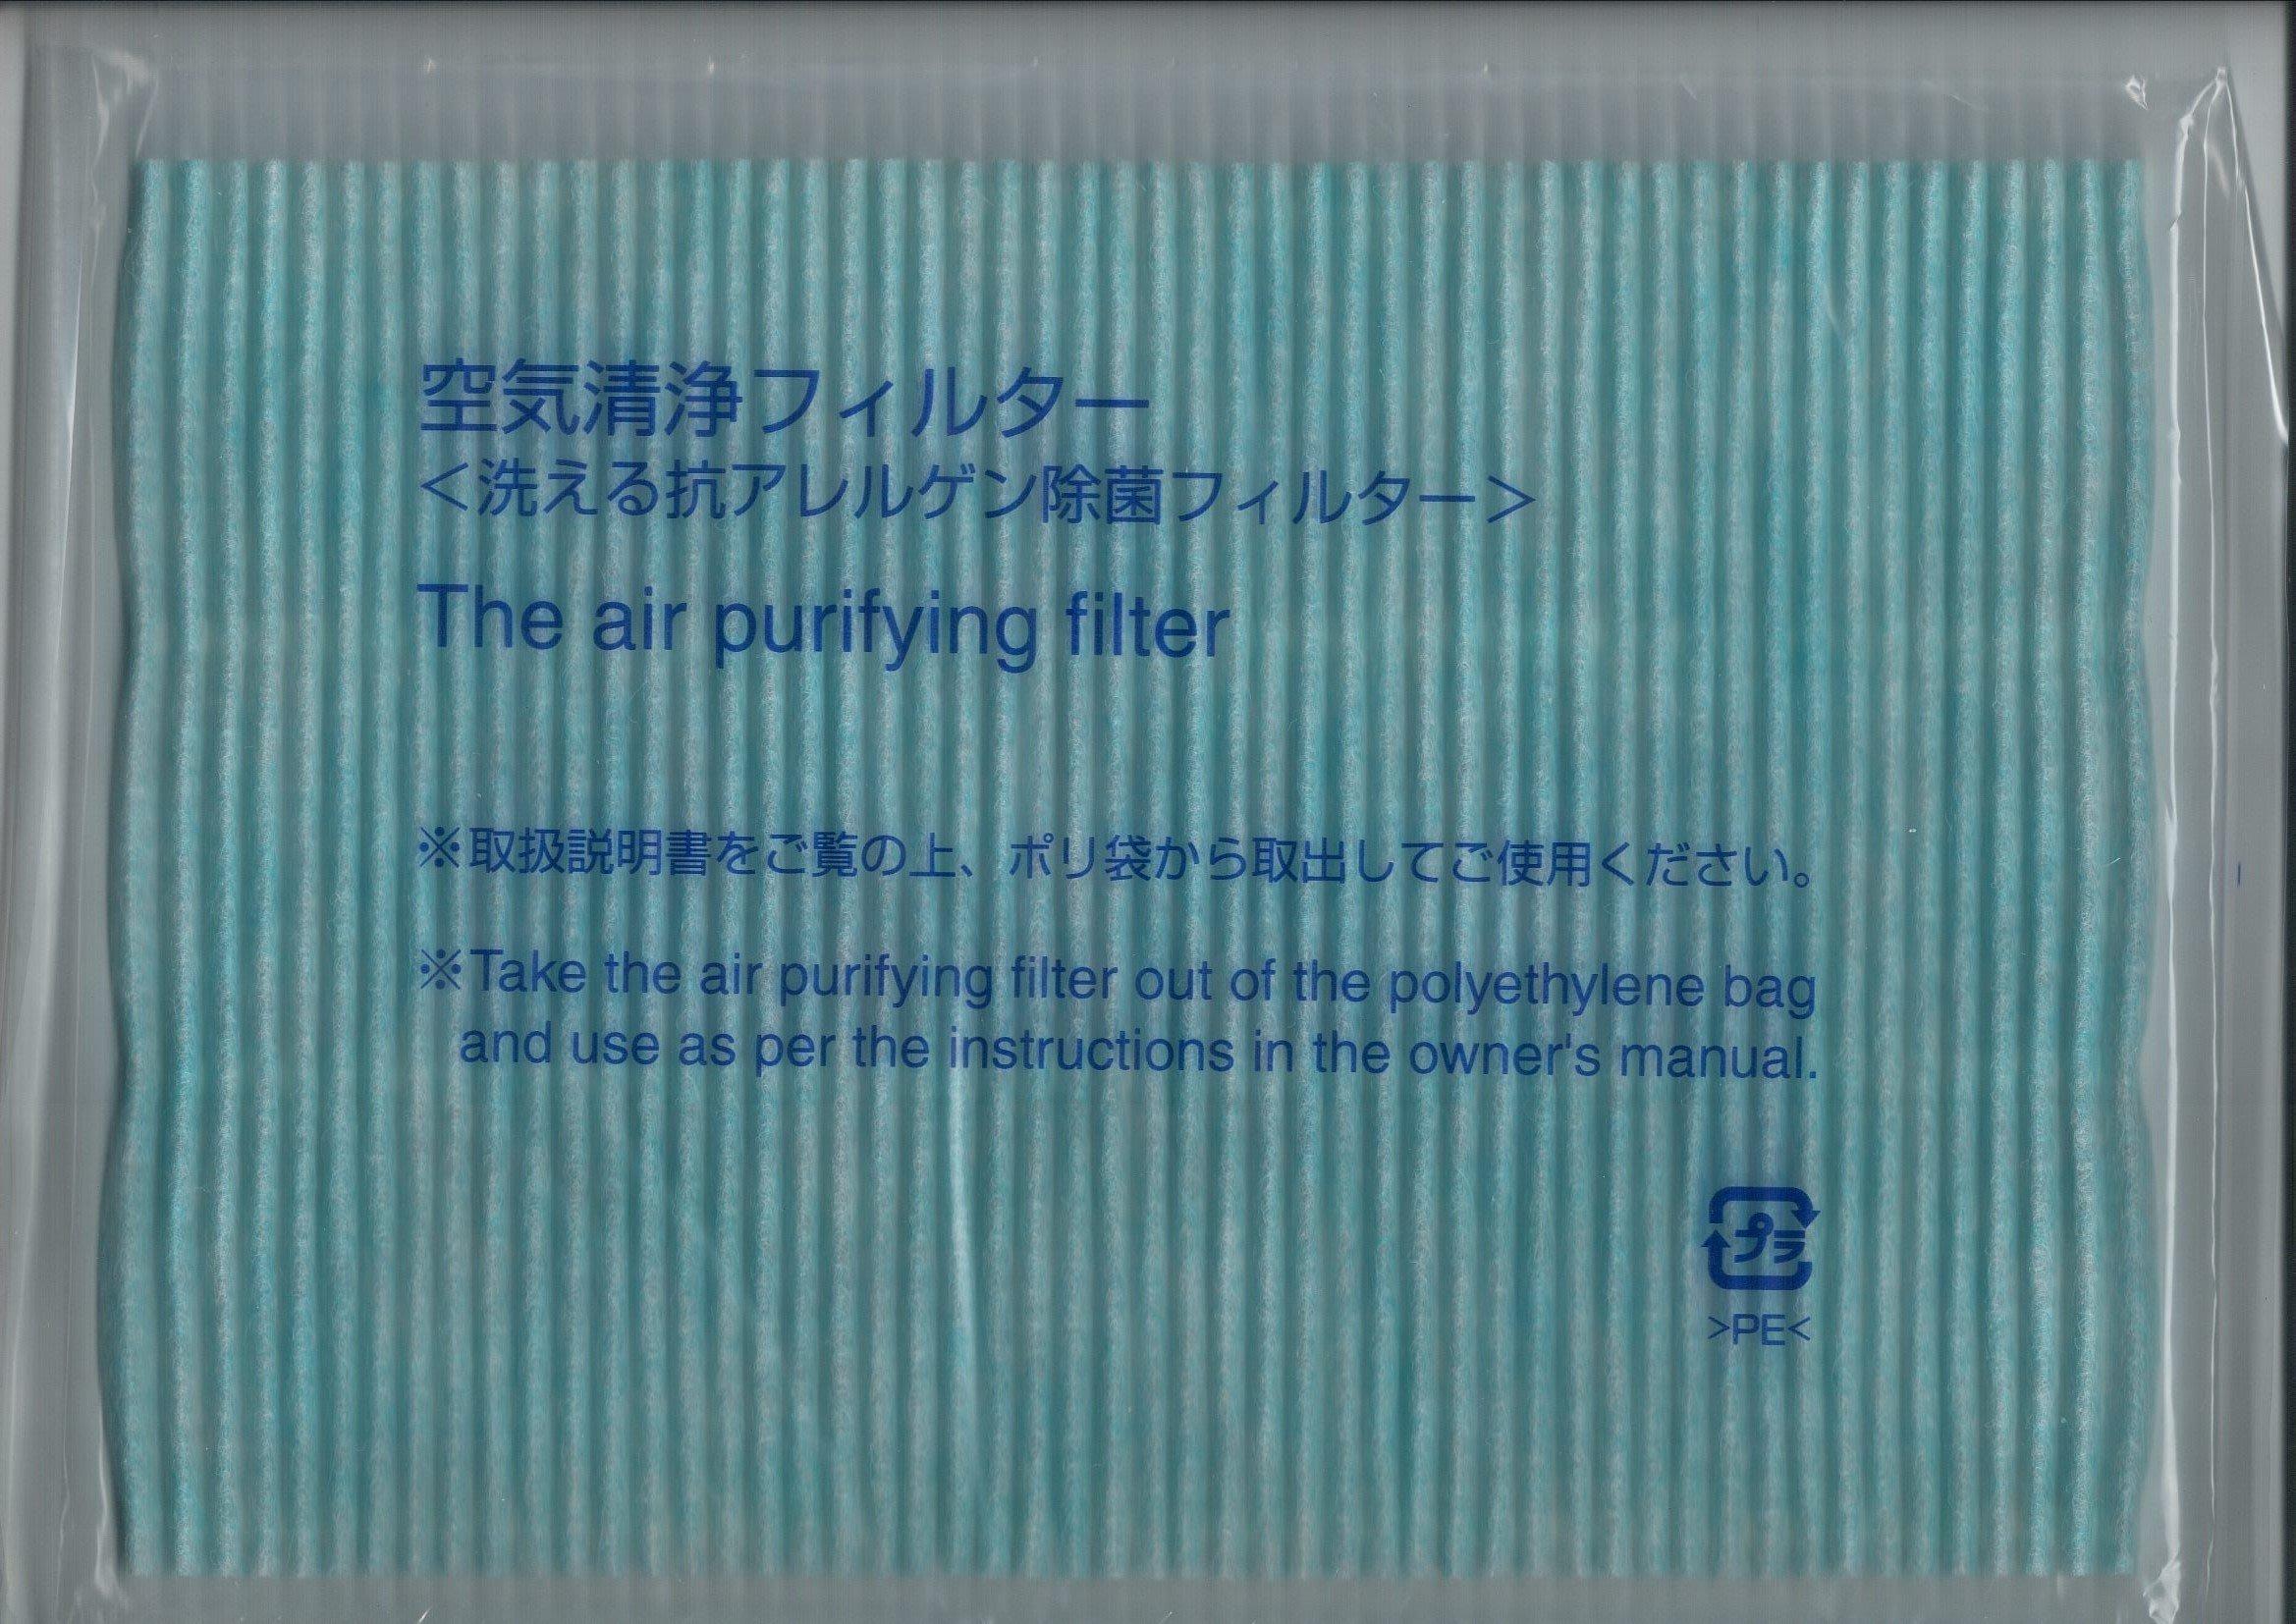 【Jp-SunMo】三菱MITSUBISHI智慧型清淨除濕機_原廠銀離子濾網_適用機種MJ-E100WX-TW3【現貨】